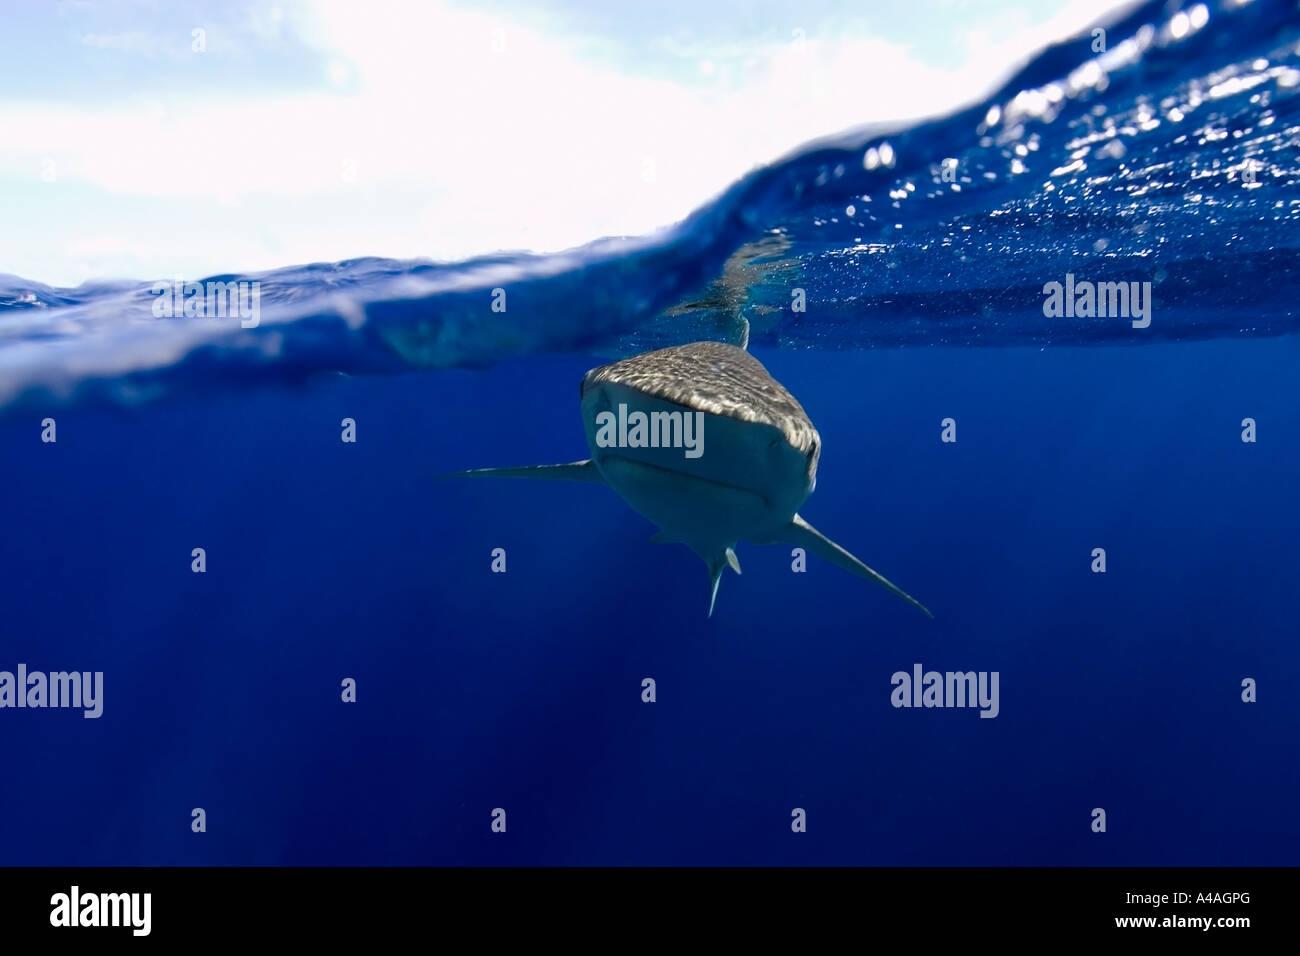 Galapagos sharks Carcharhinus galapagensis Oahu Hawaii - Stock Image